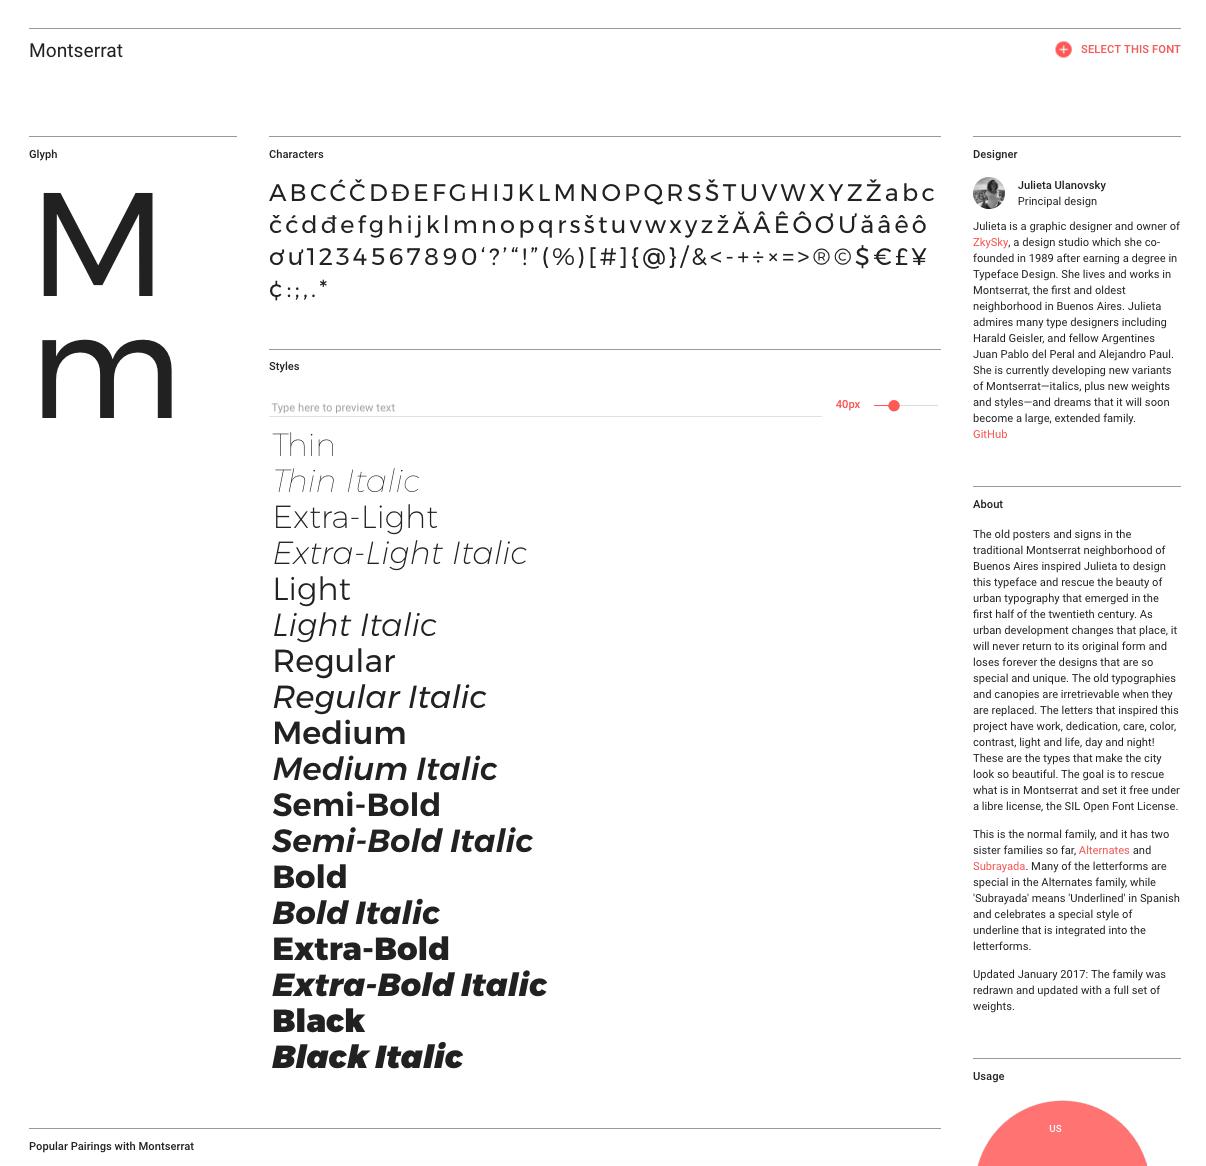 Resultado de Google Fonts de Montserrat